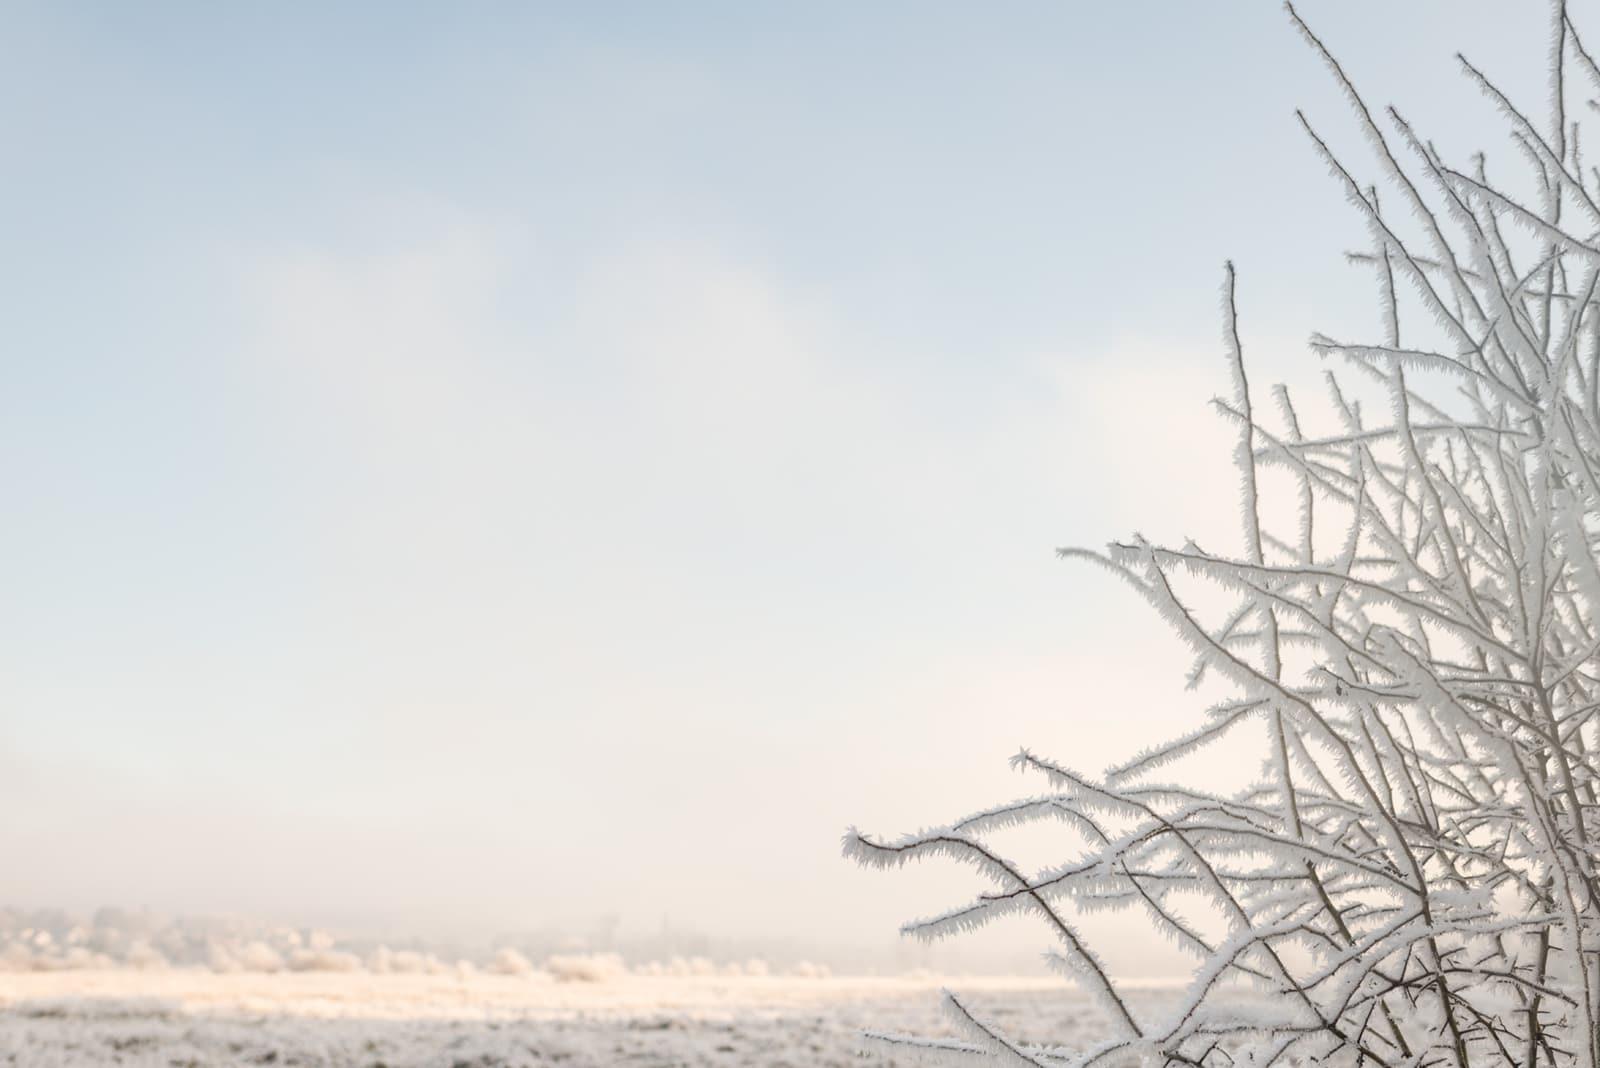 20161231 7319 - Winter in Limburg